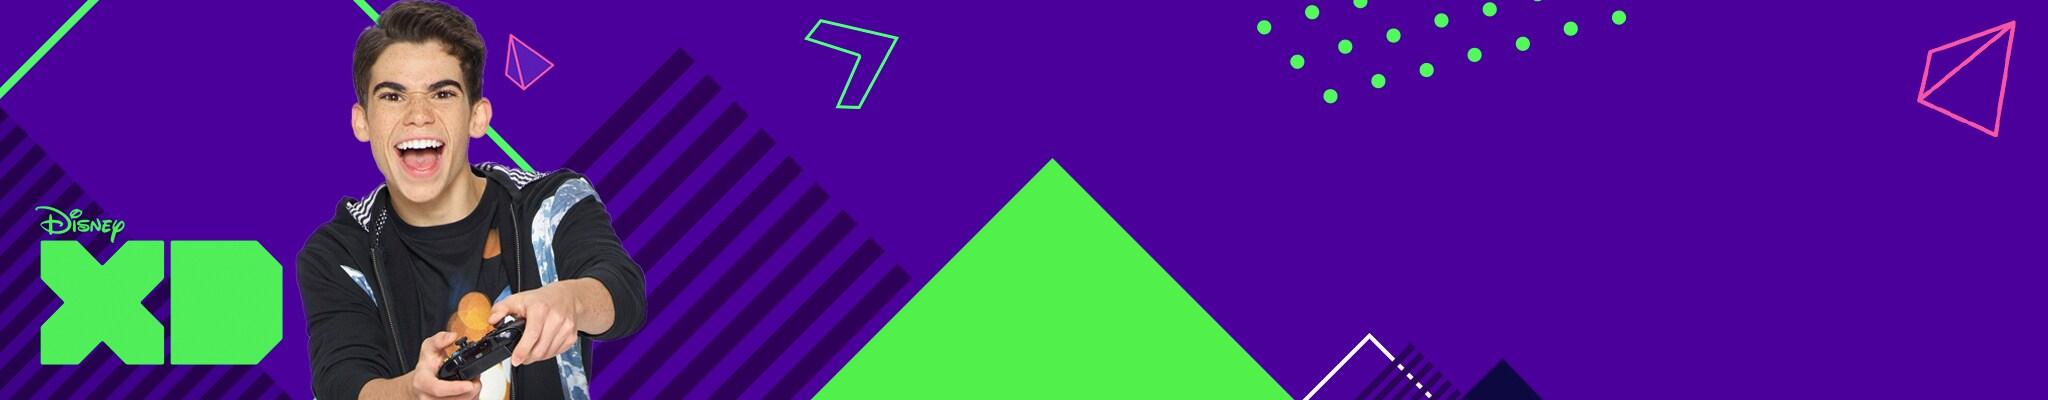 NL DXD - Crosslink Hero banner - Gamers Handleiding Showpage